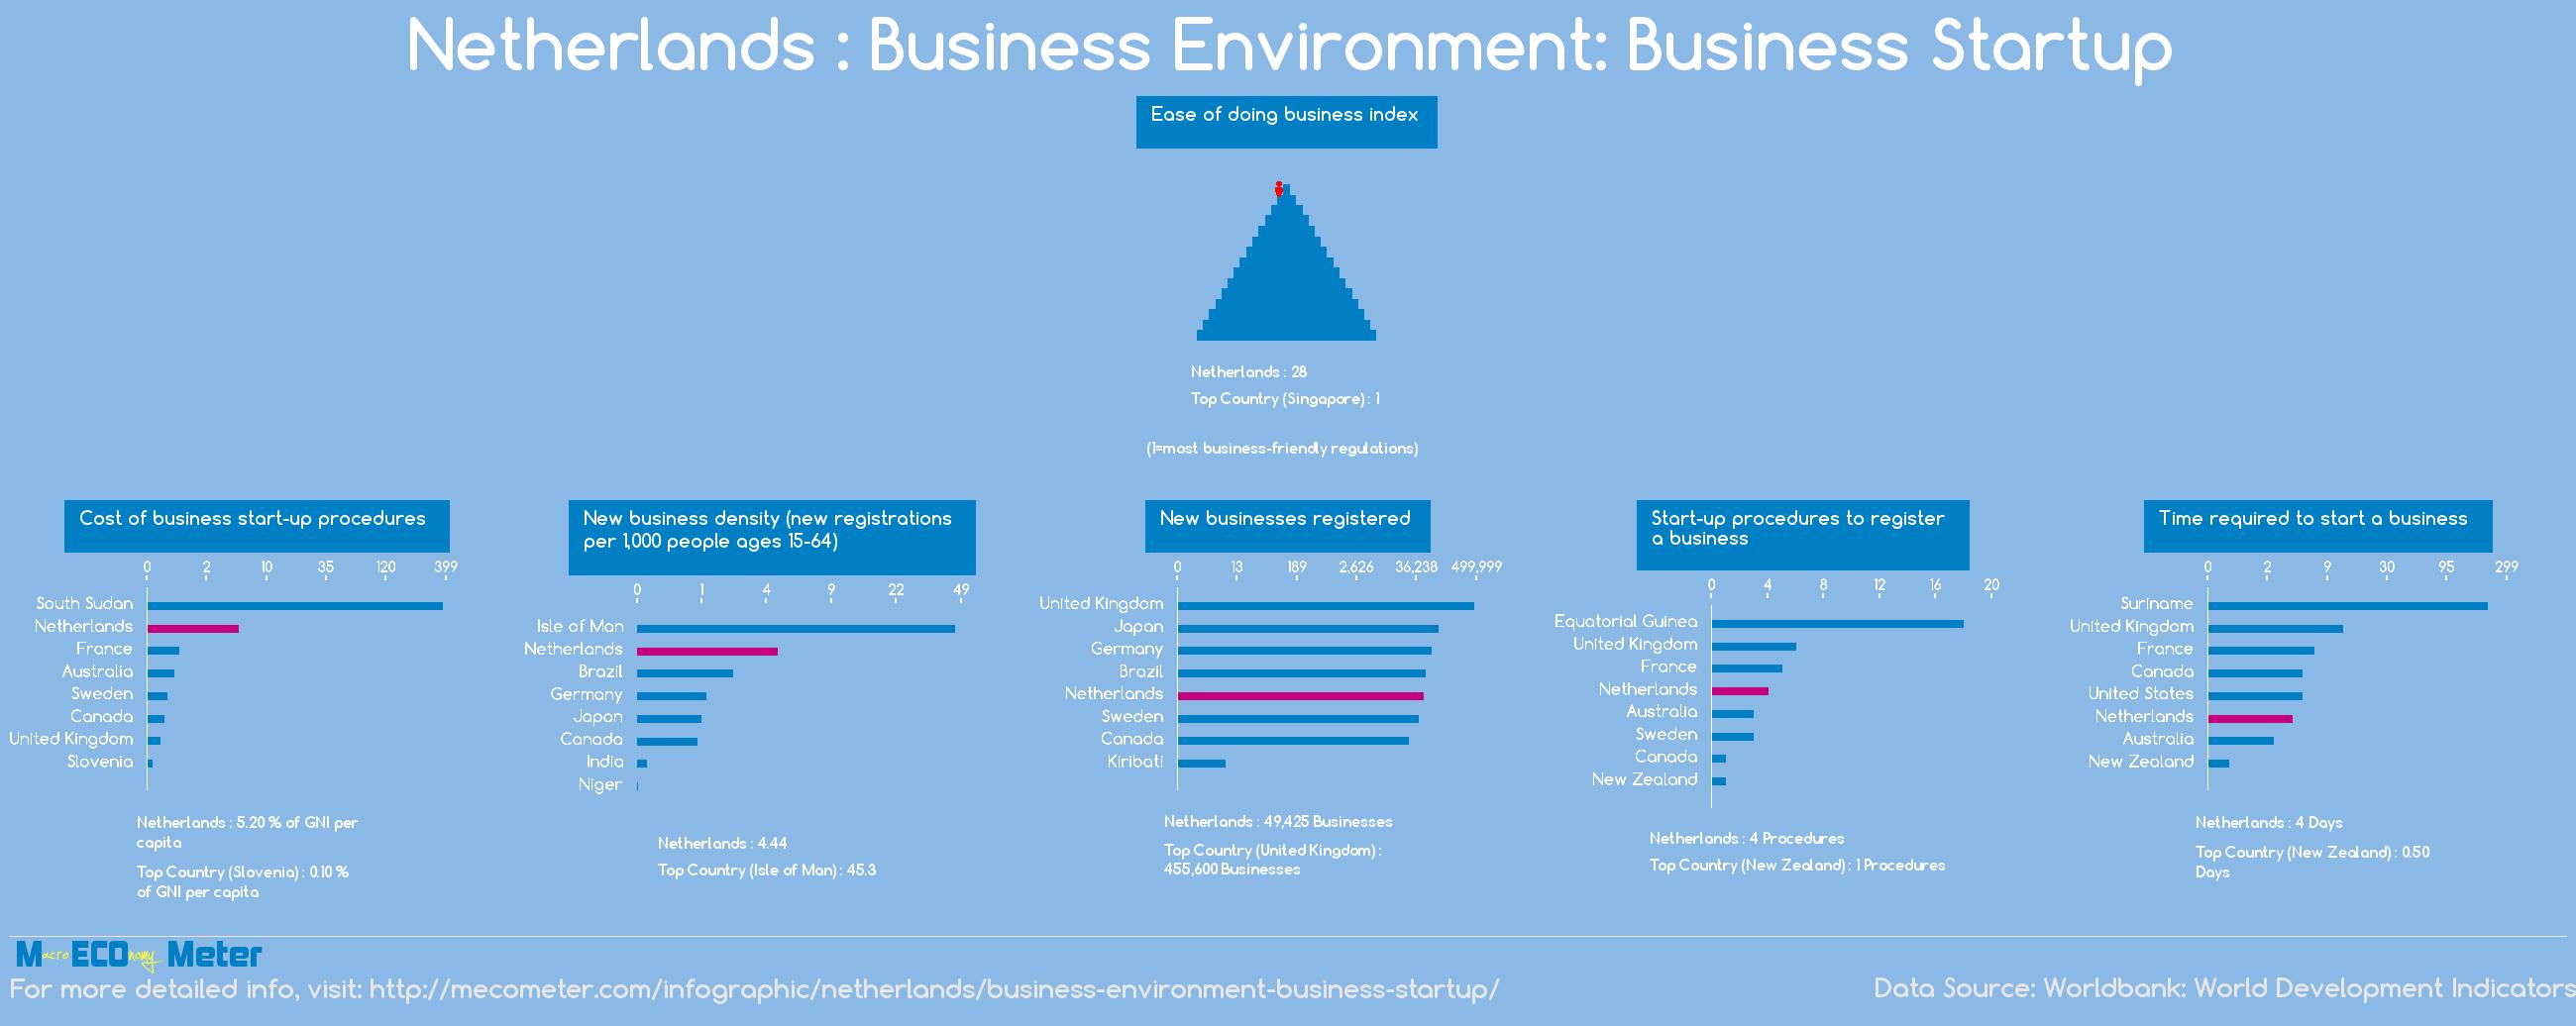 Netherlands : Business Environment: Business Startup